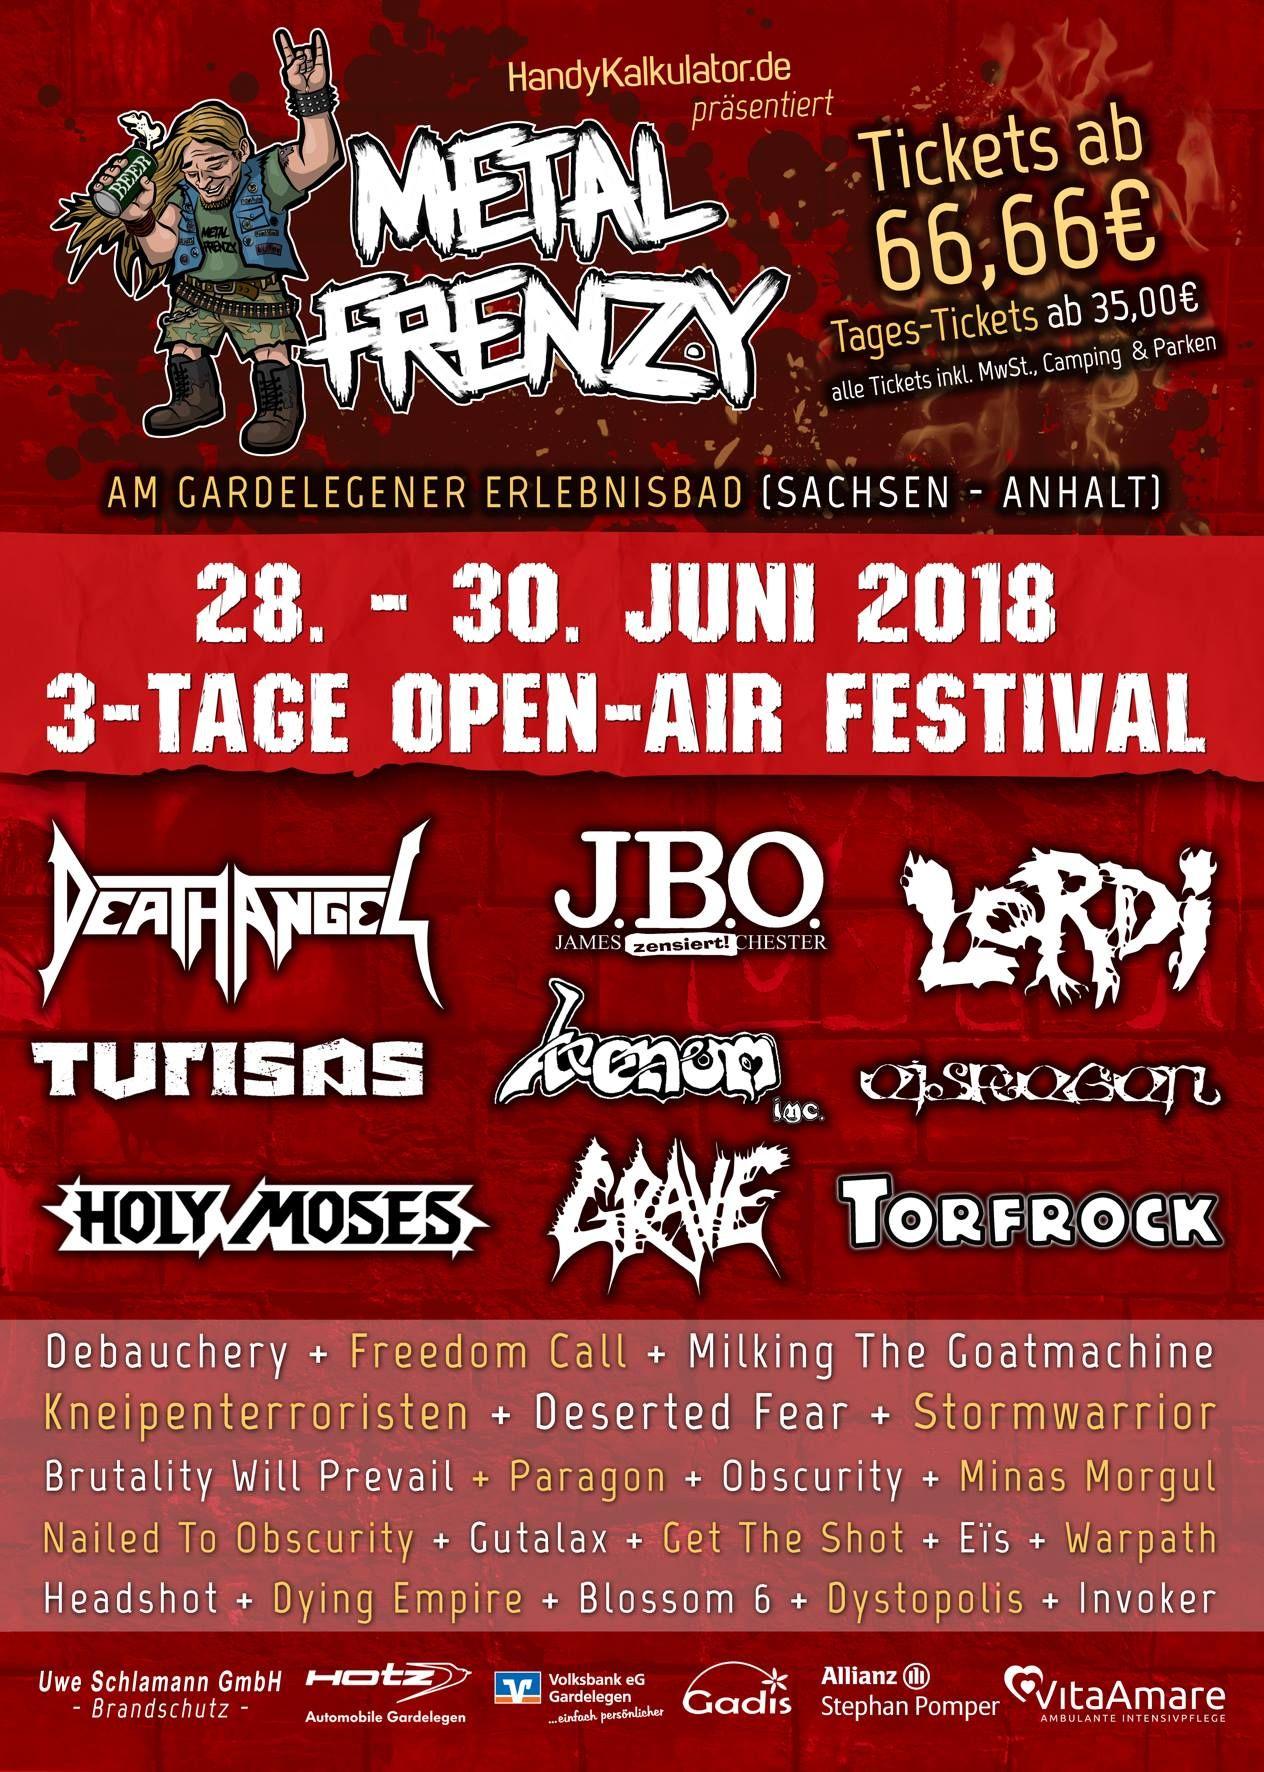 Metal Frenzy Festival, 28.-30.06.2018, Gardelegen – Vorbericht